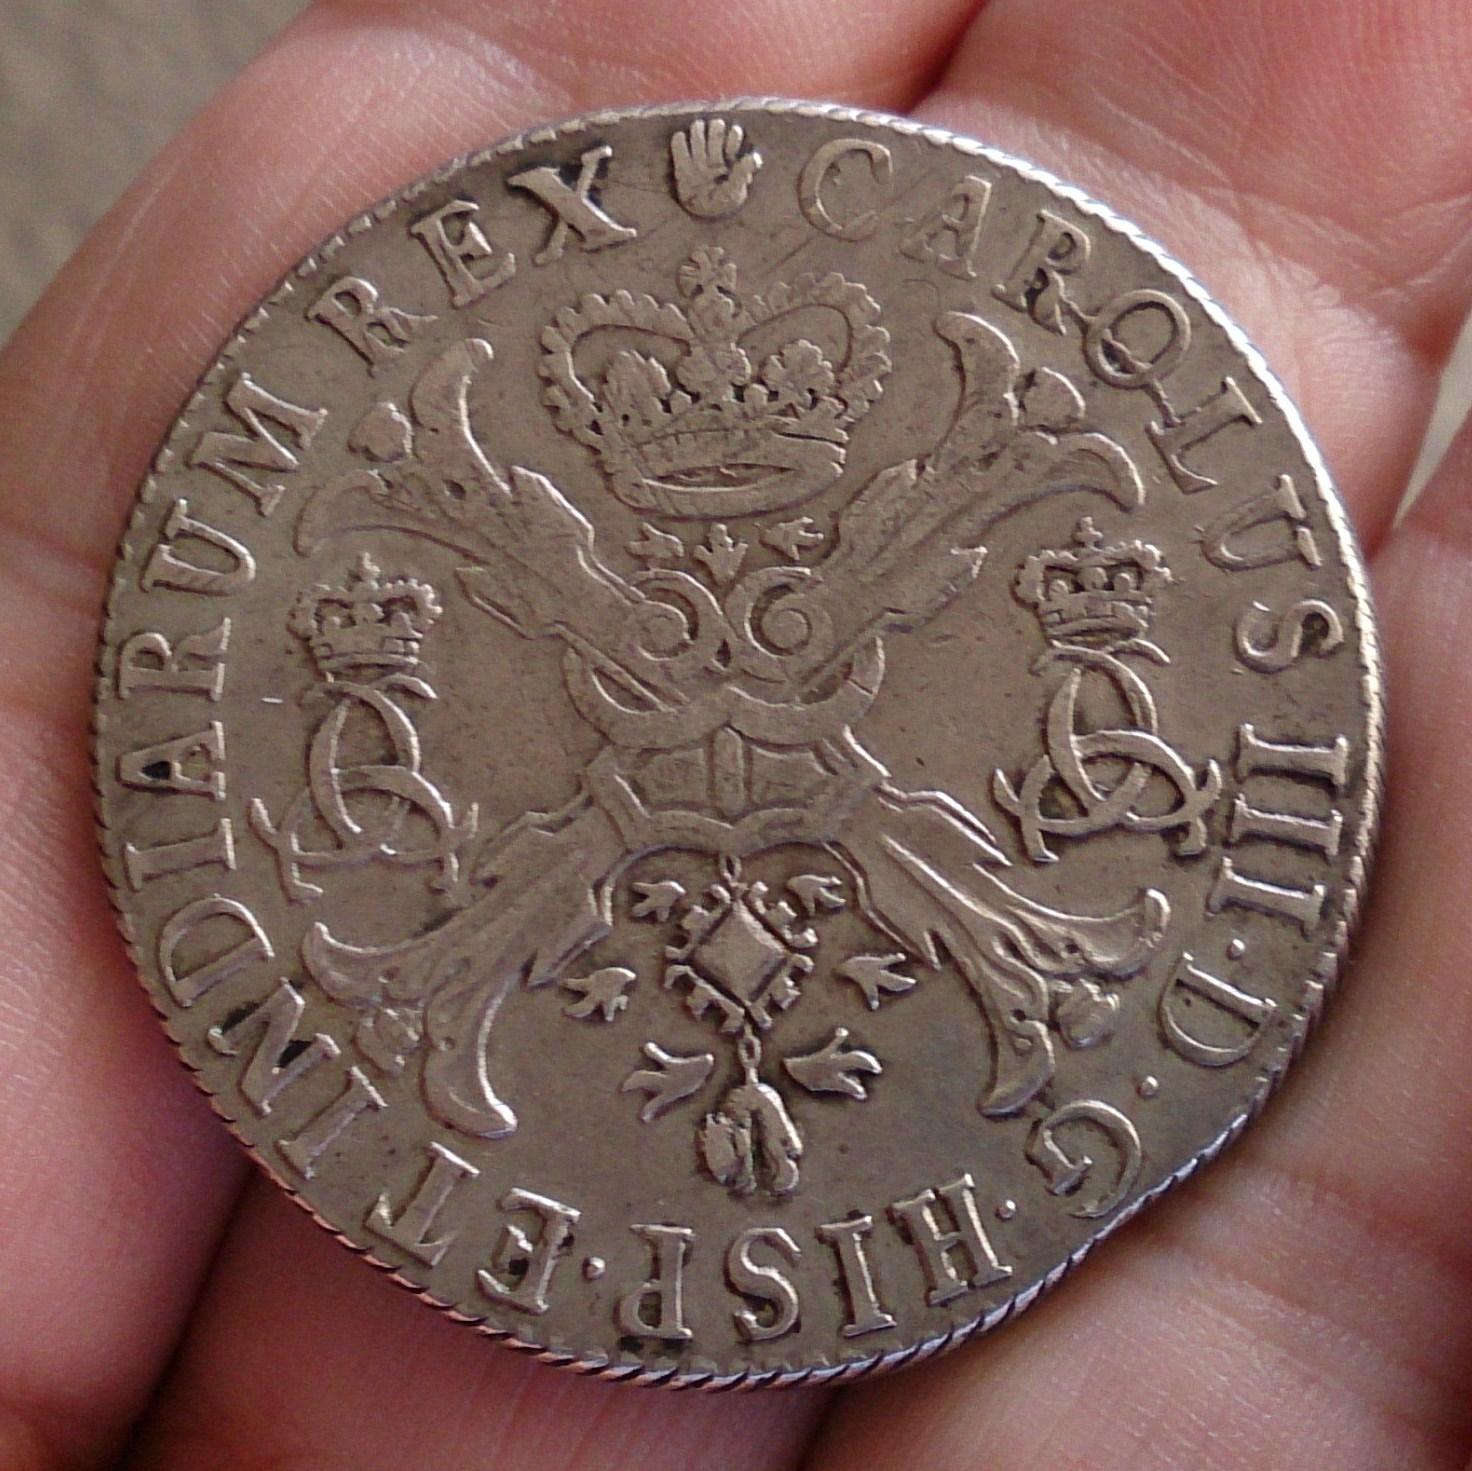 Patagón 1709. Carlos III (pretendiente). Brabante (Amberes) 27xjdhx